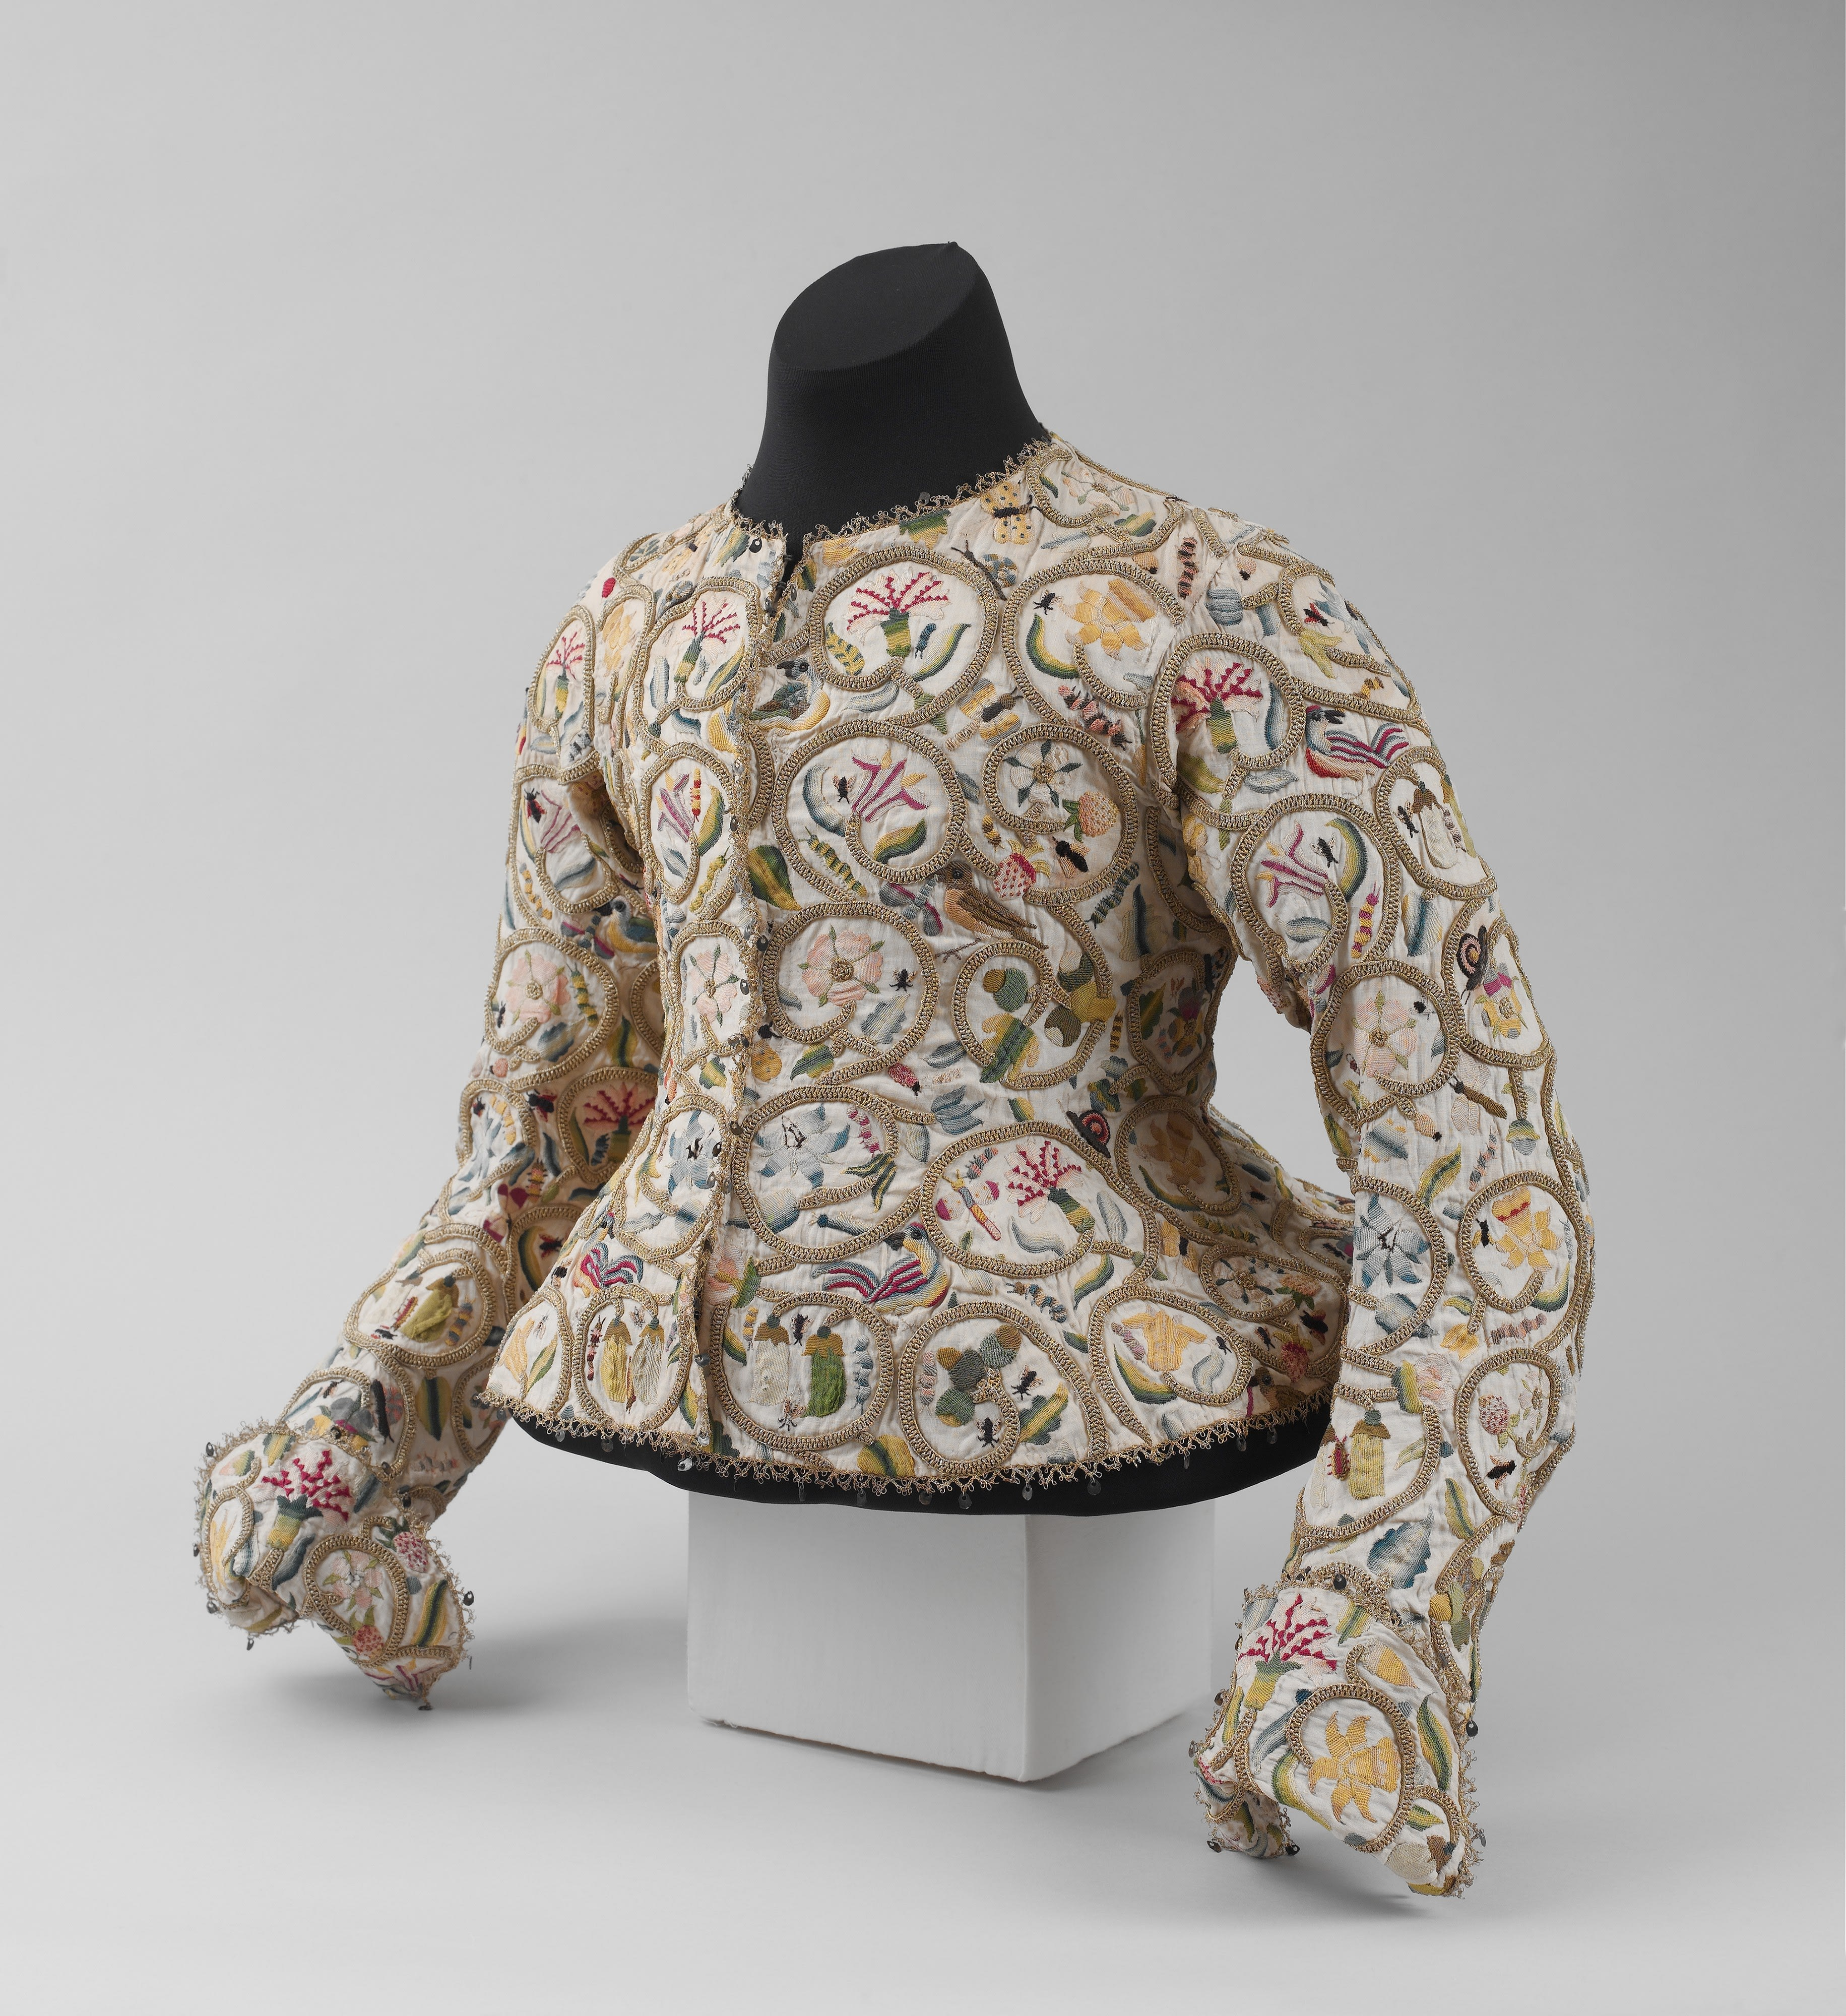 British embroidered jacket from circa 1616, copyright: Metropolitan Museum of Art, New York